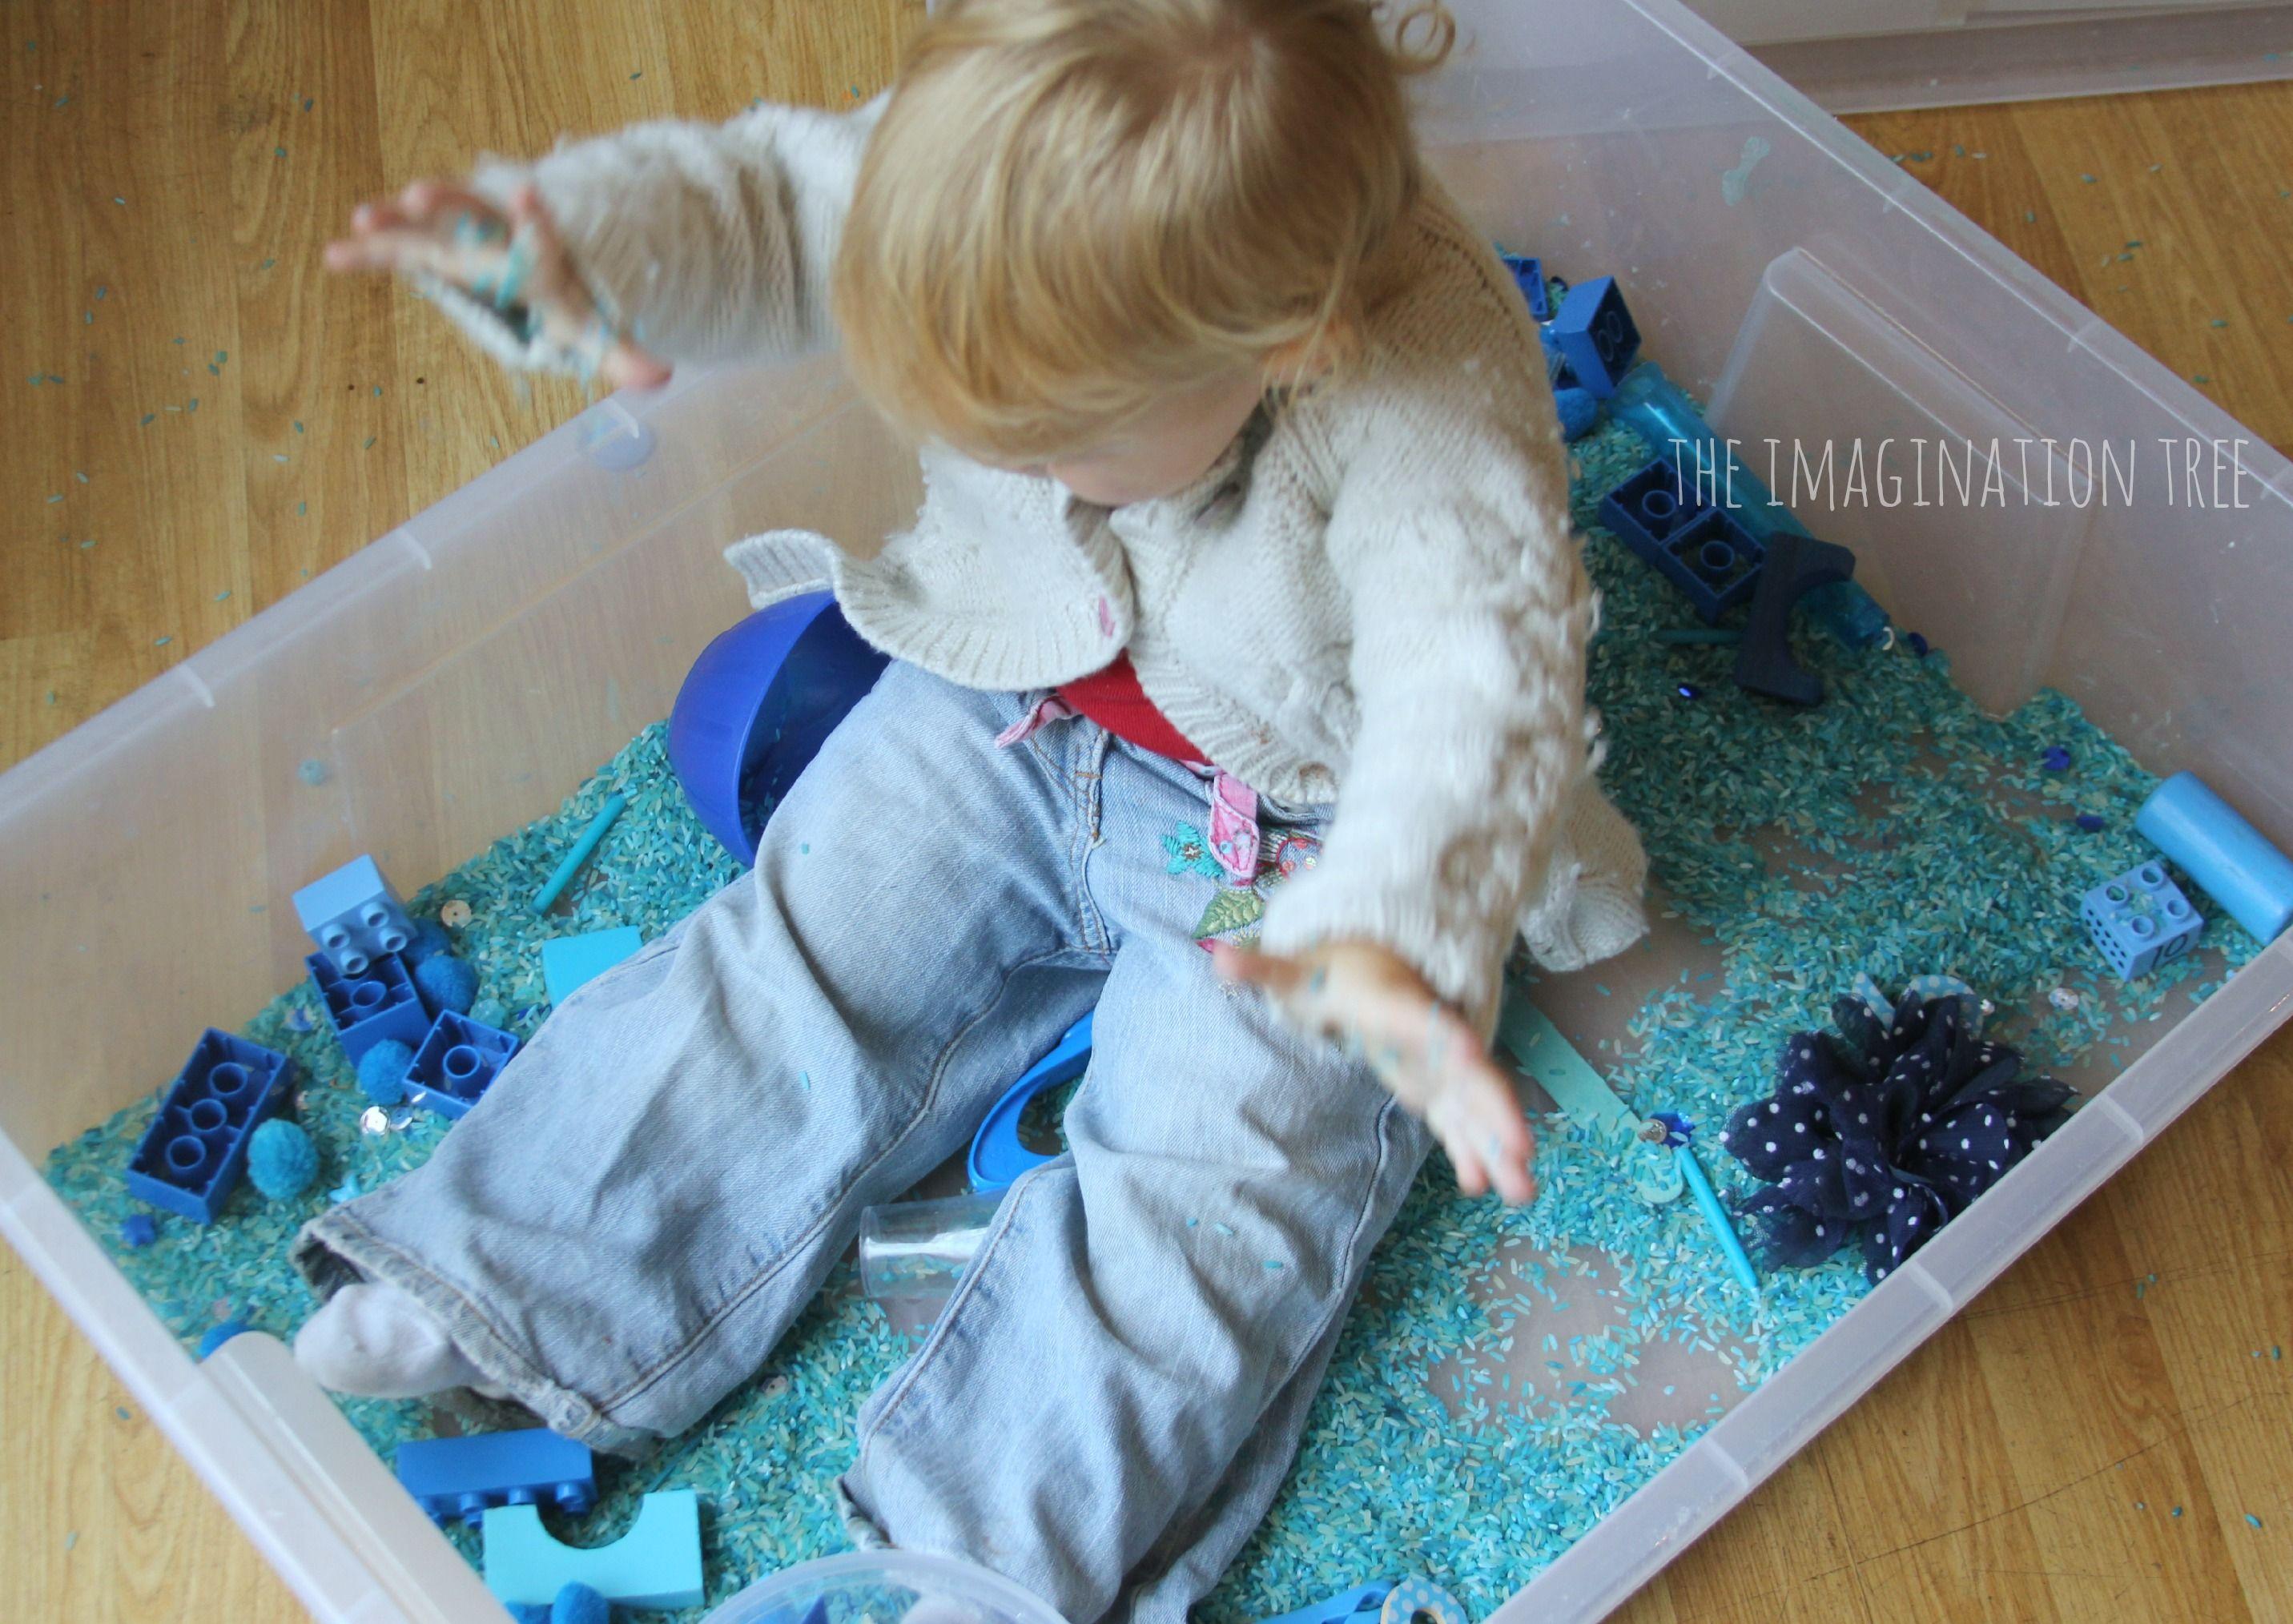 Giant Colour Themed Sensory Tub | Sensory tubs, Motor activities and ...